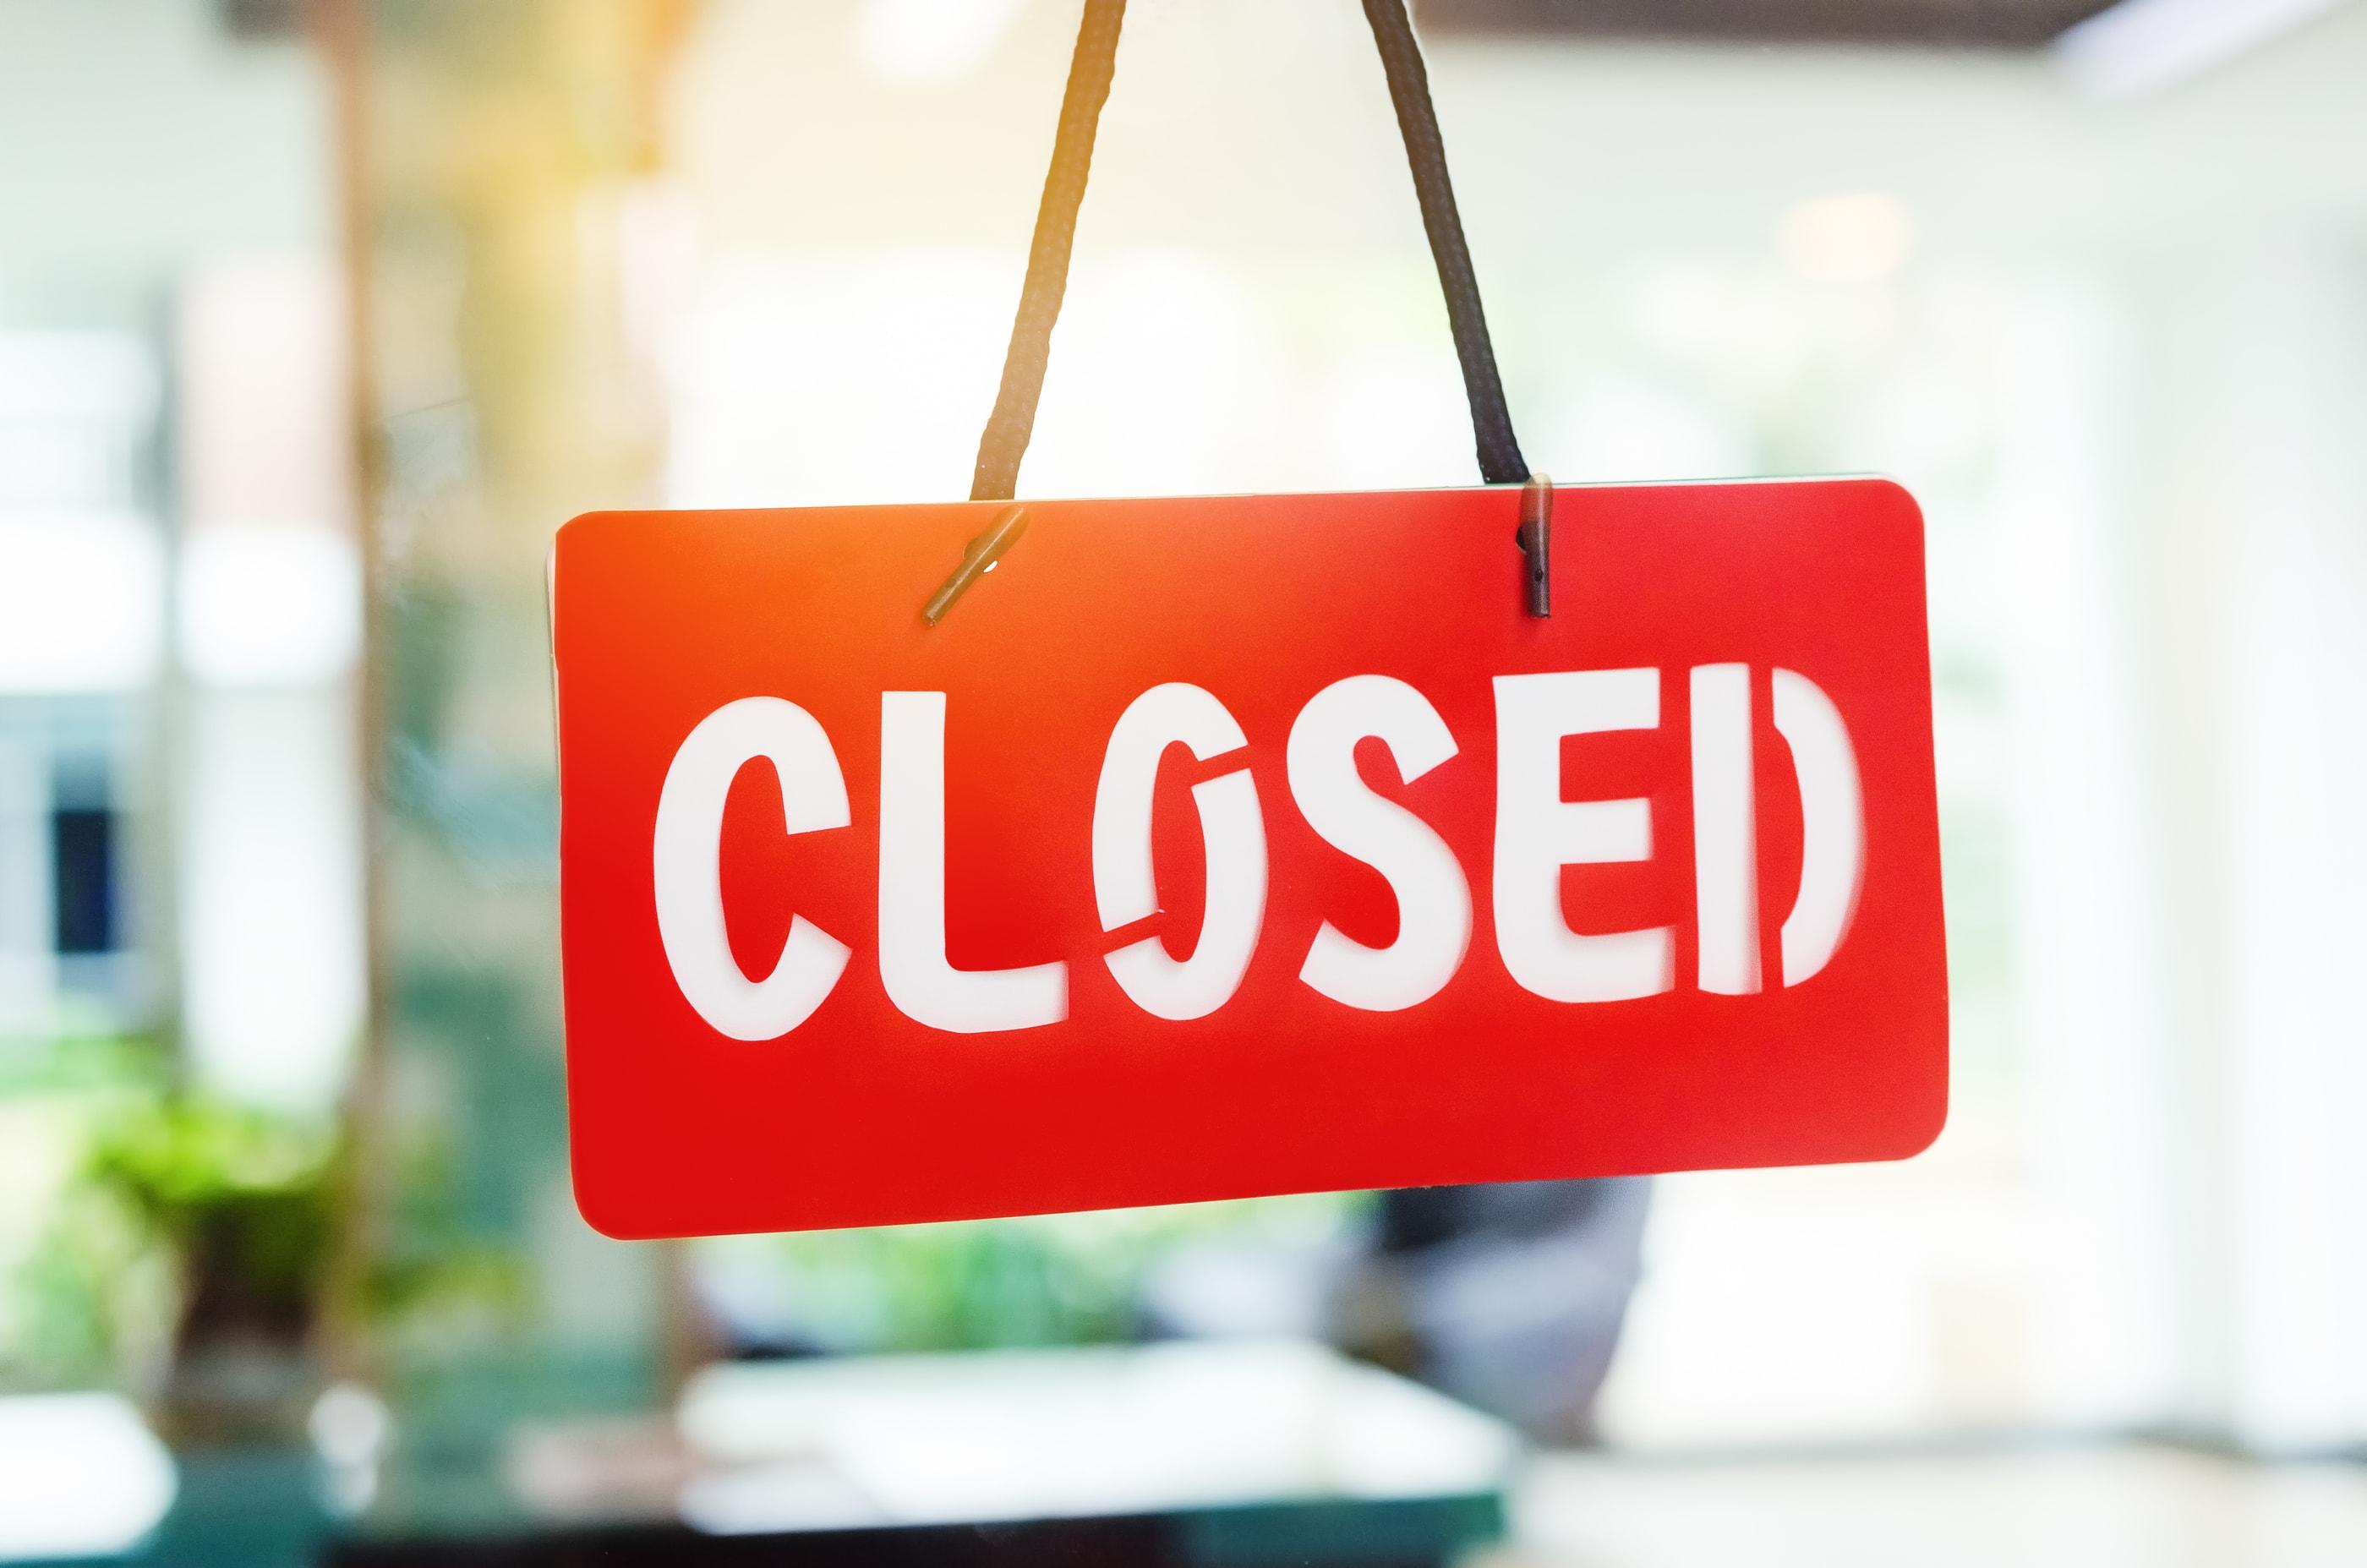 oficina cerrada gremicat